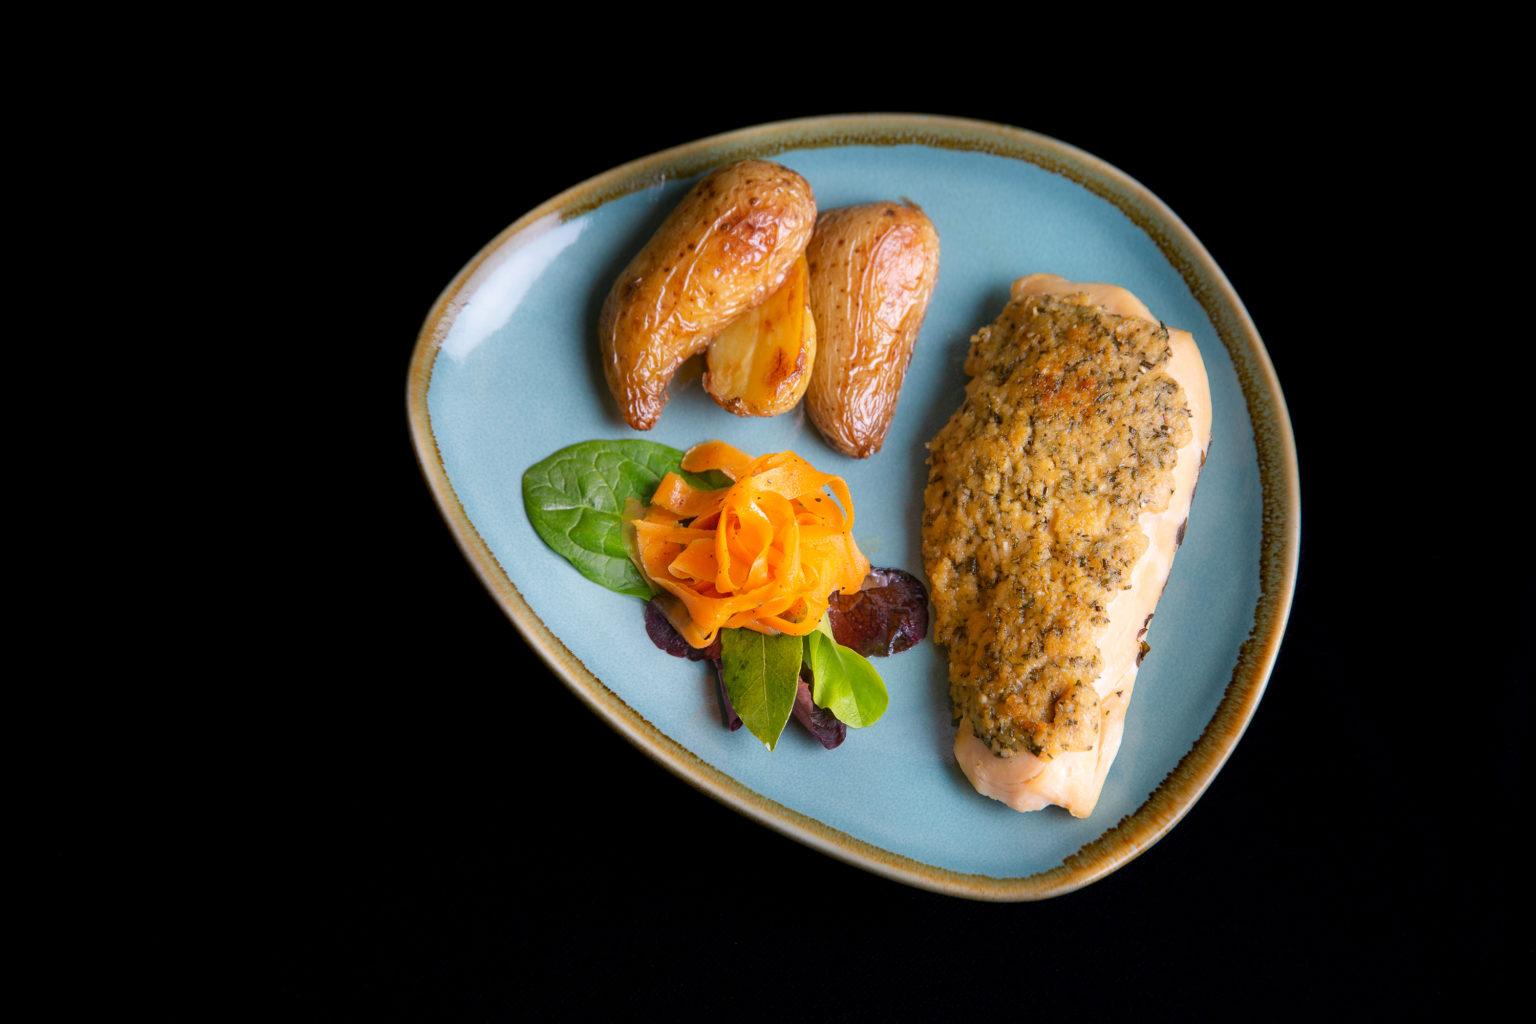 chef restaurant italien, tapas, revisitation,